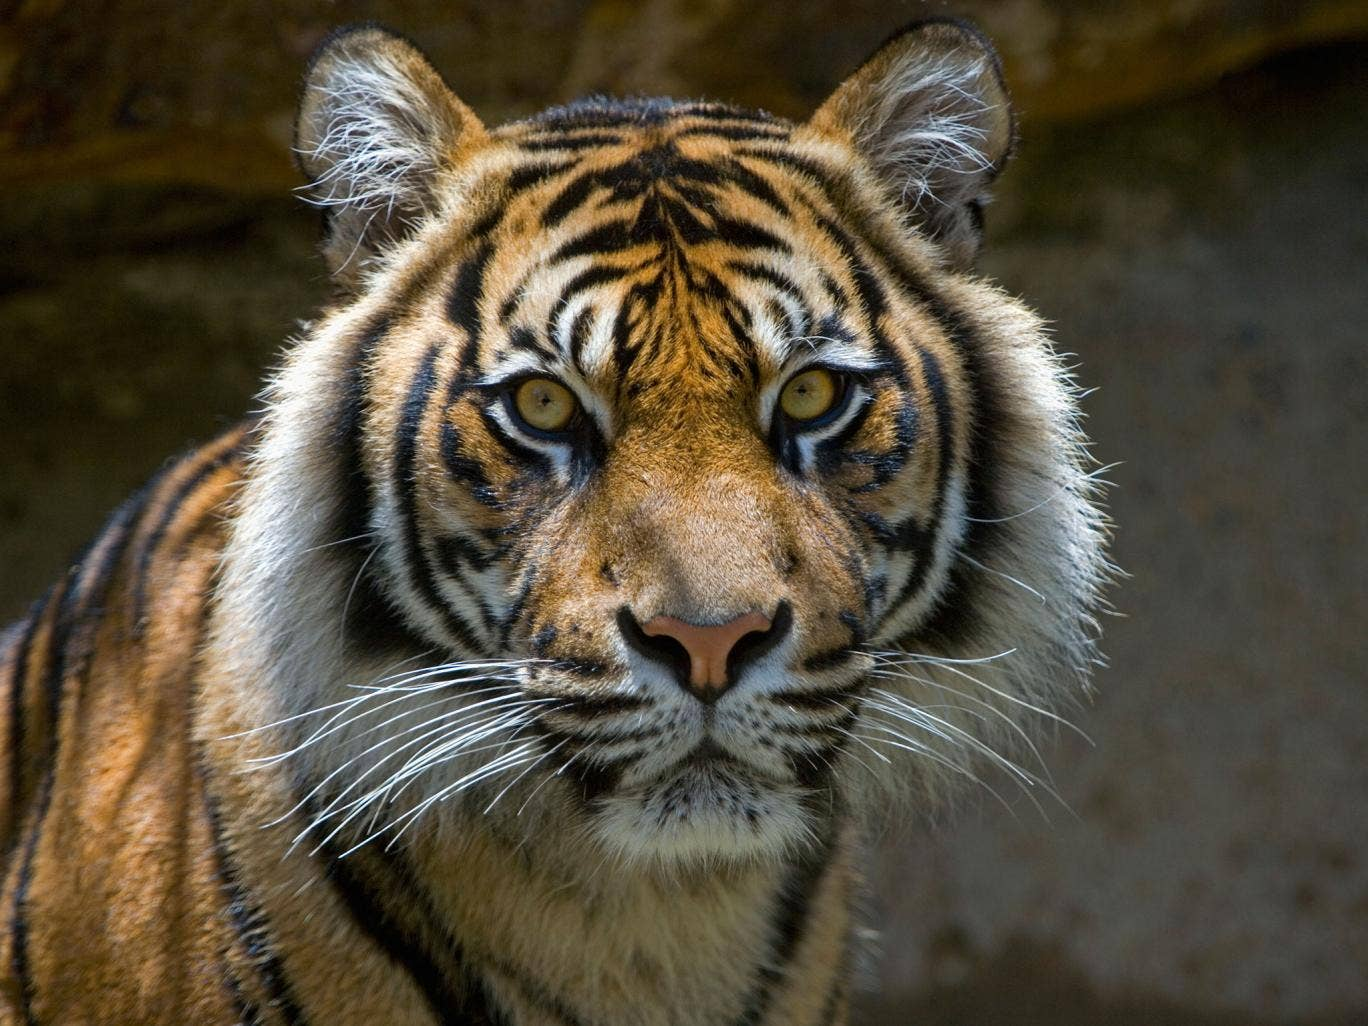 A captive Sumatran tiger in Indonesia in 2005